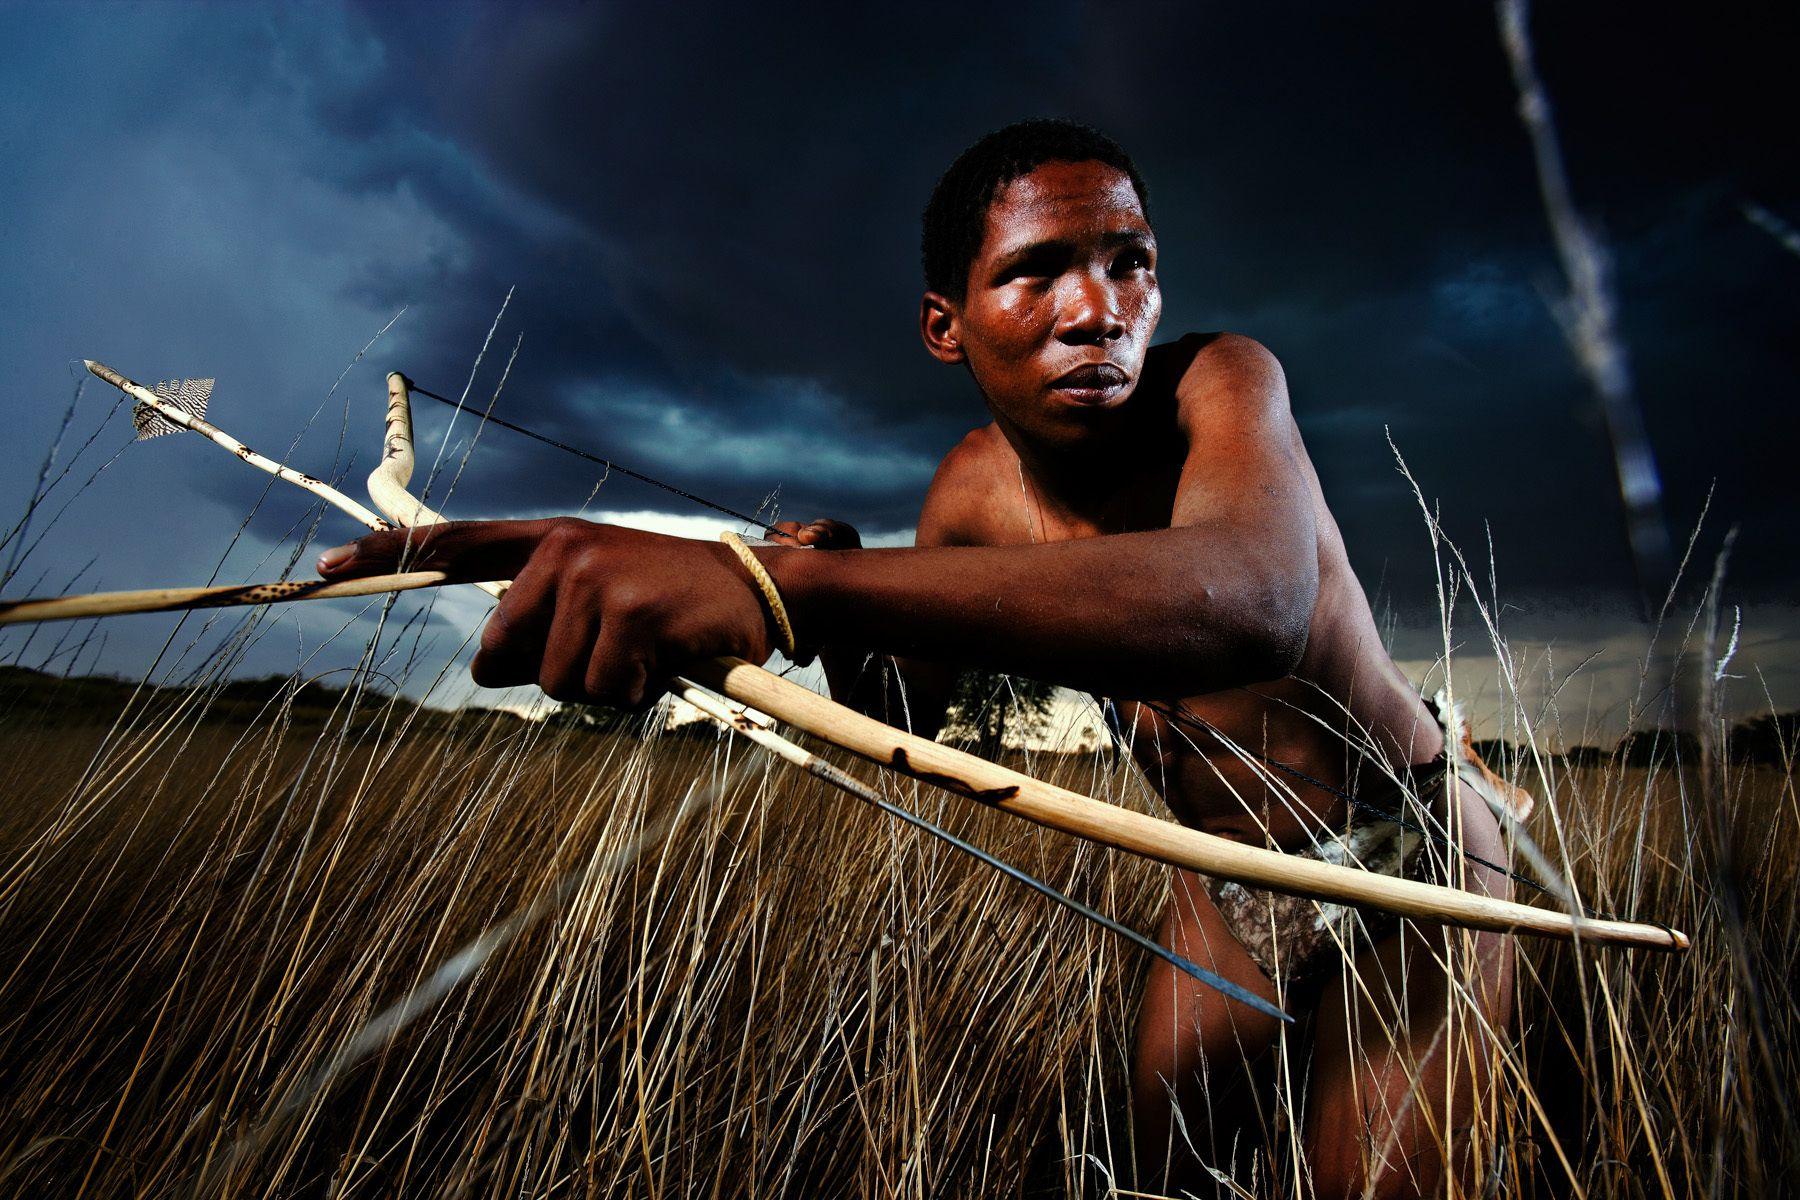 Kalahari San Bushmen hunting lions. Photo by Brent Stirton